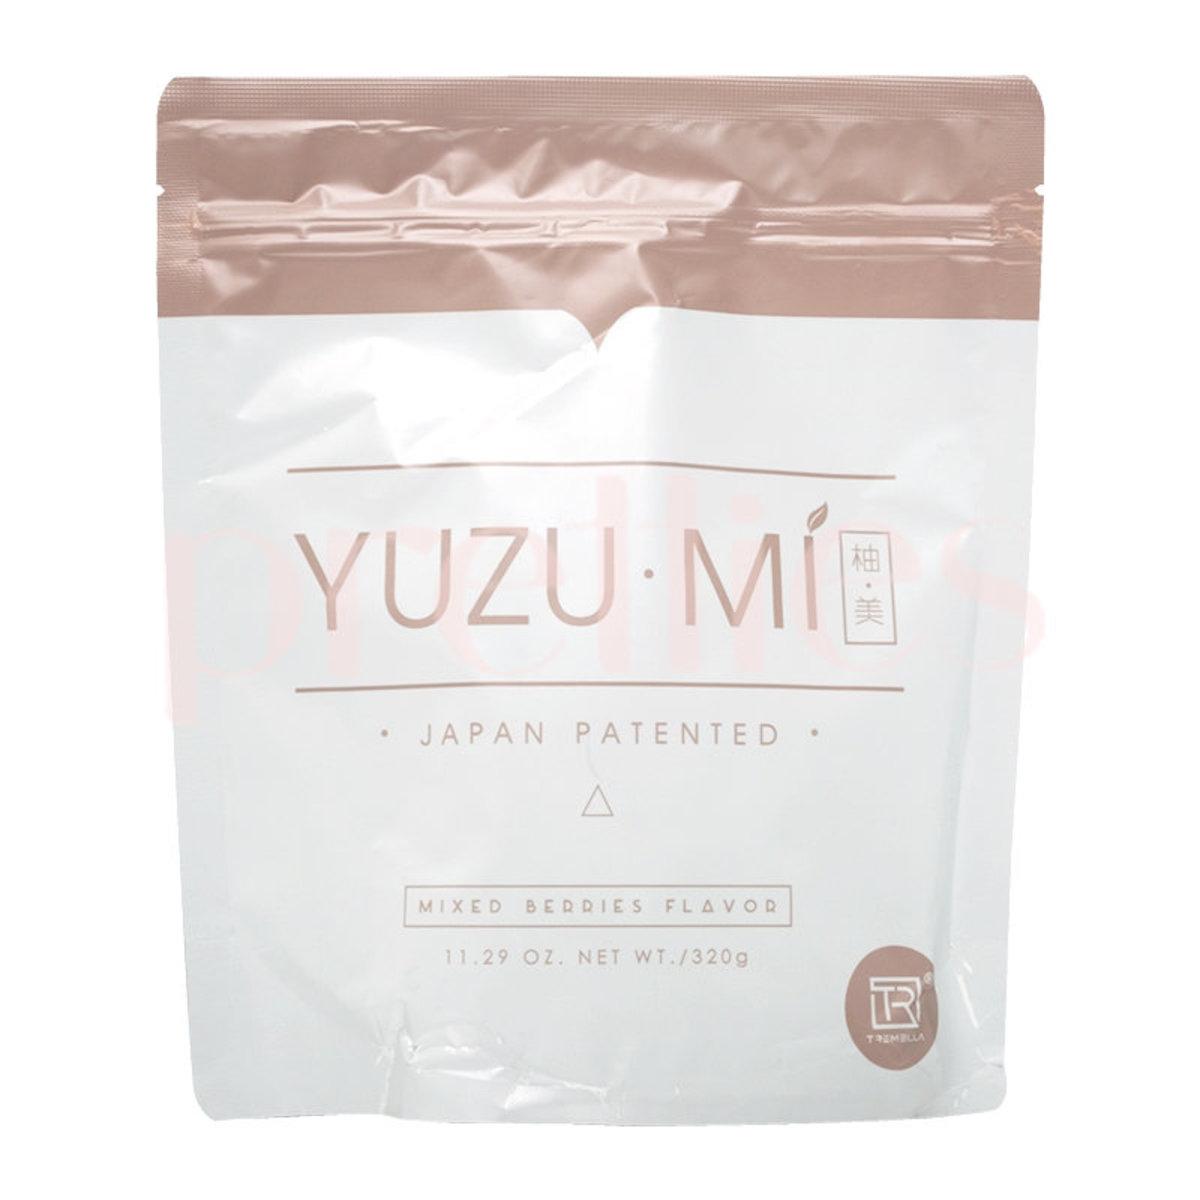 YUZUMI Comprehensive Detox Drink Veggies Fruits And Enzyme(16pcs x20g) x1 (Parallel Import)